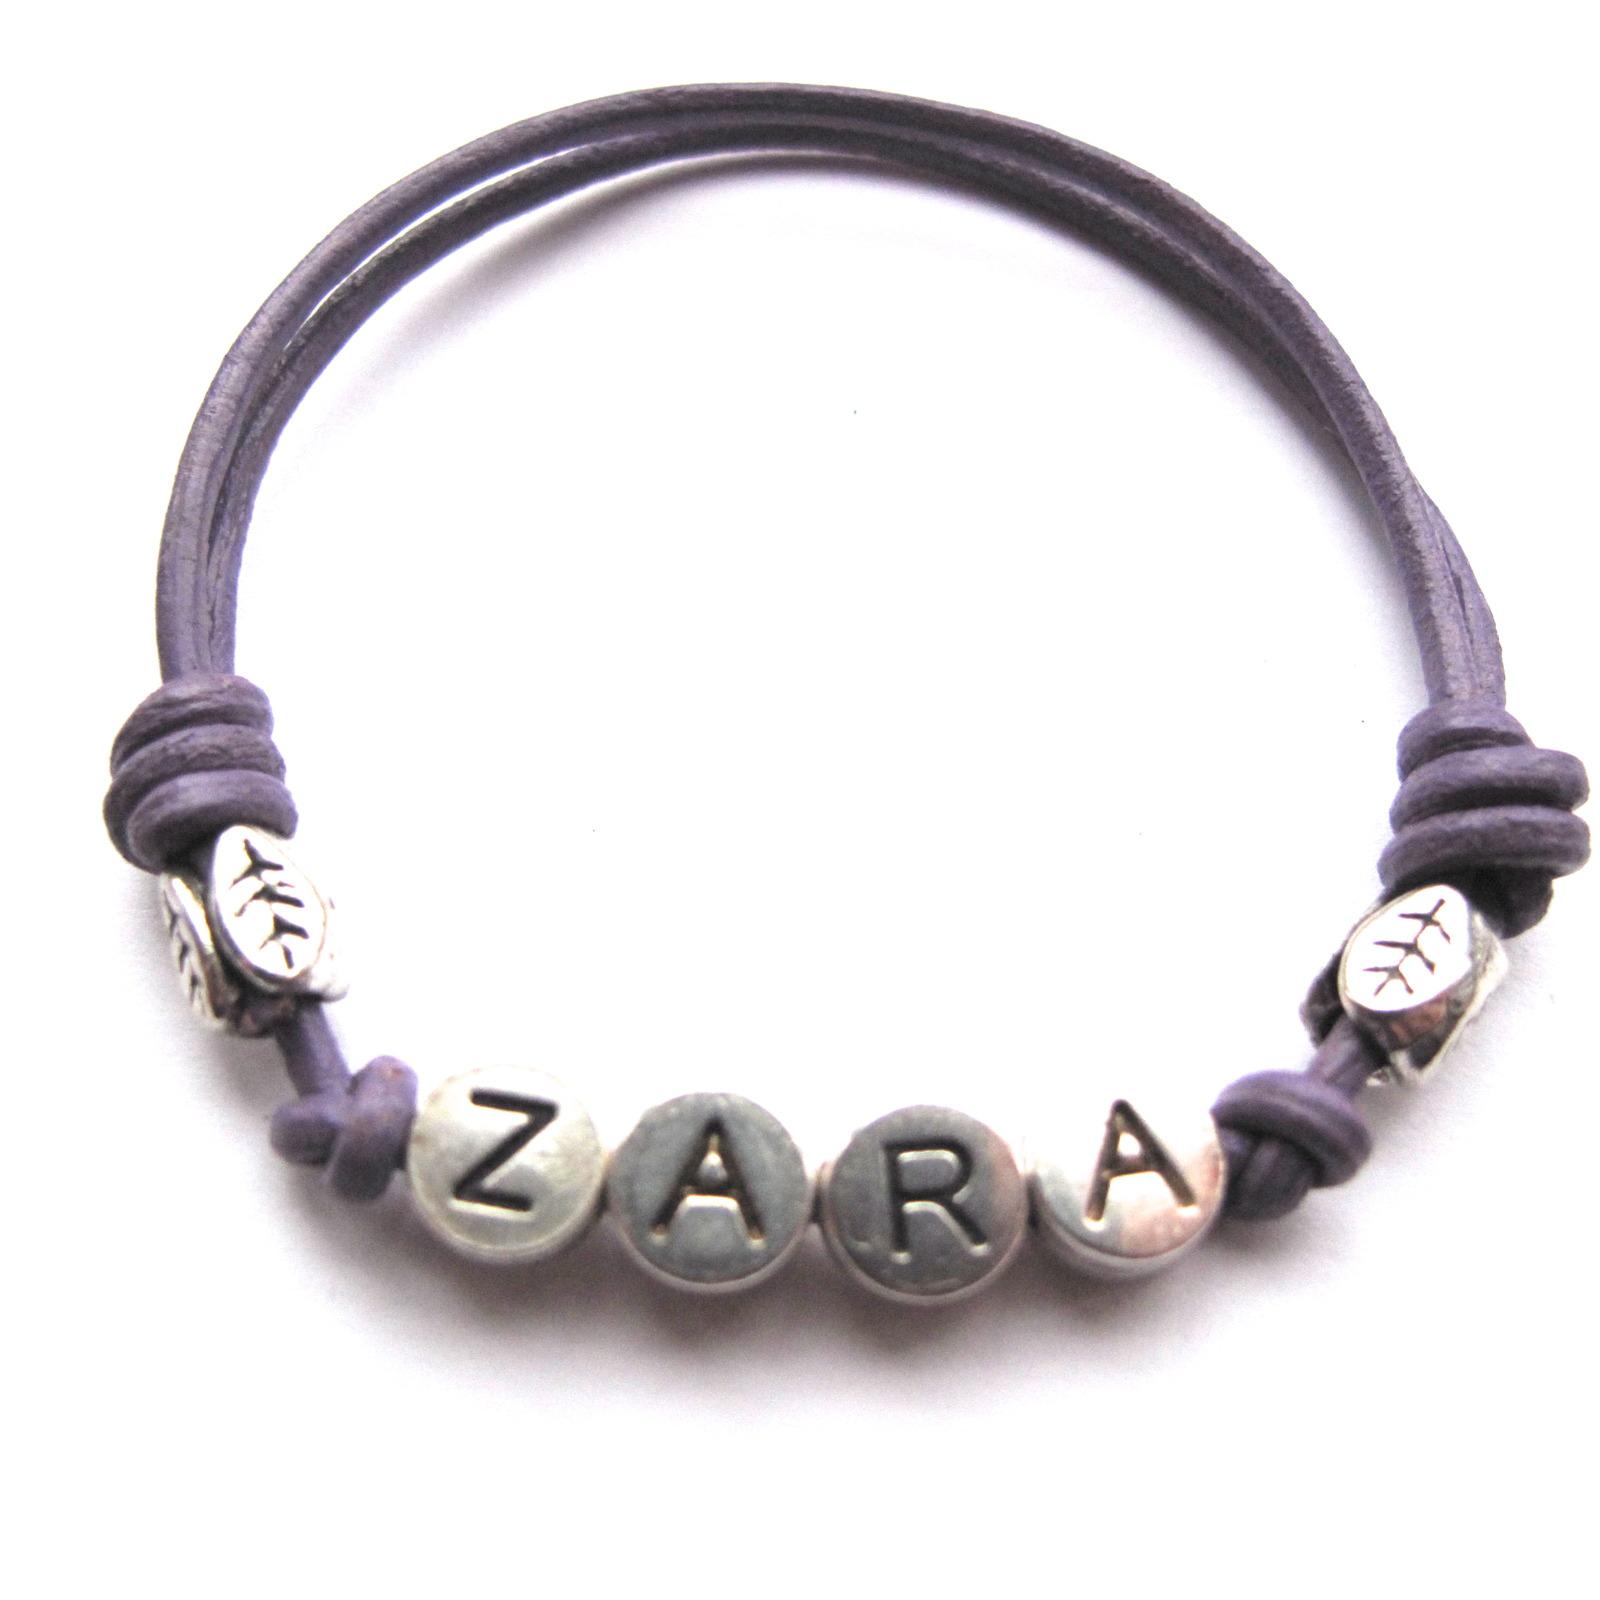 surfer style leather named writstband bracelet all